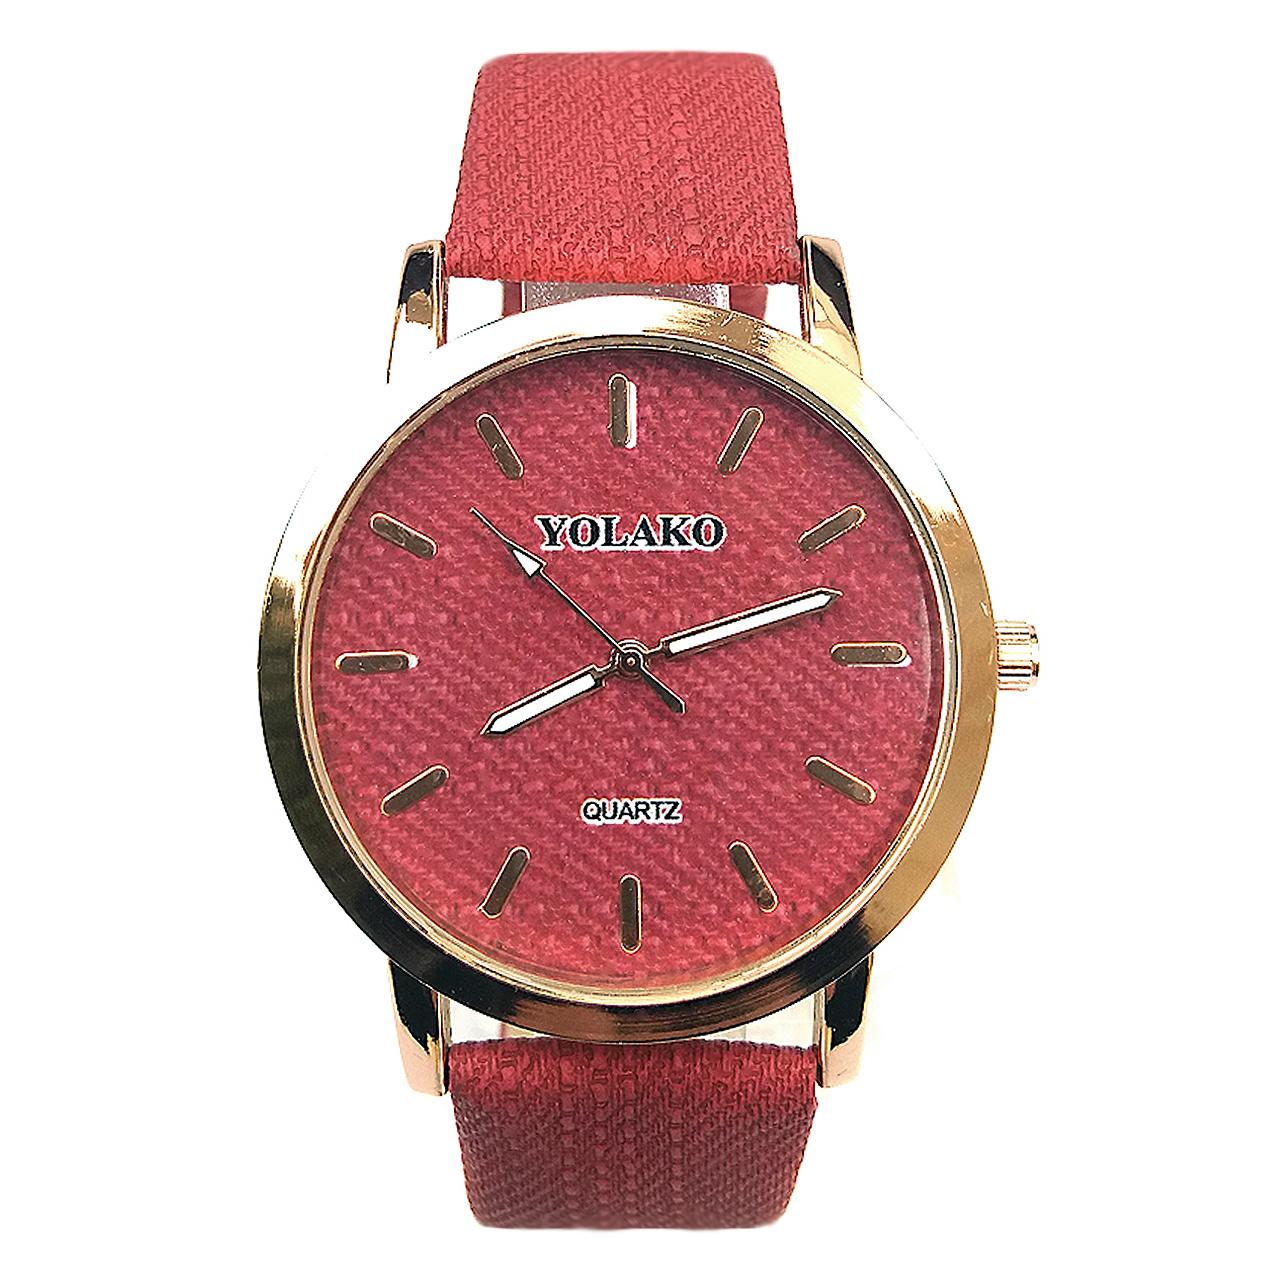 ساعت زنانه برند کارتیسی کد W2161